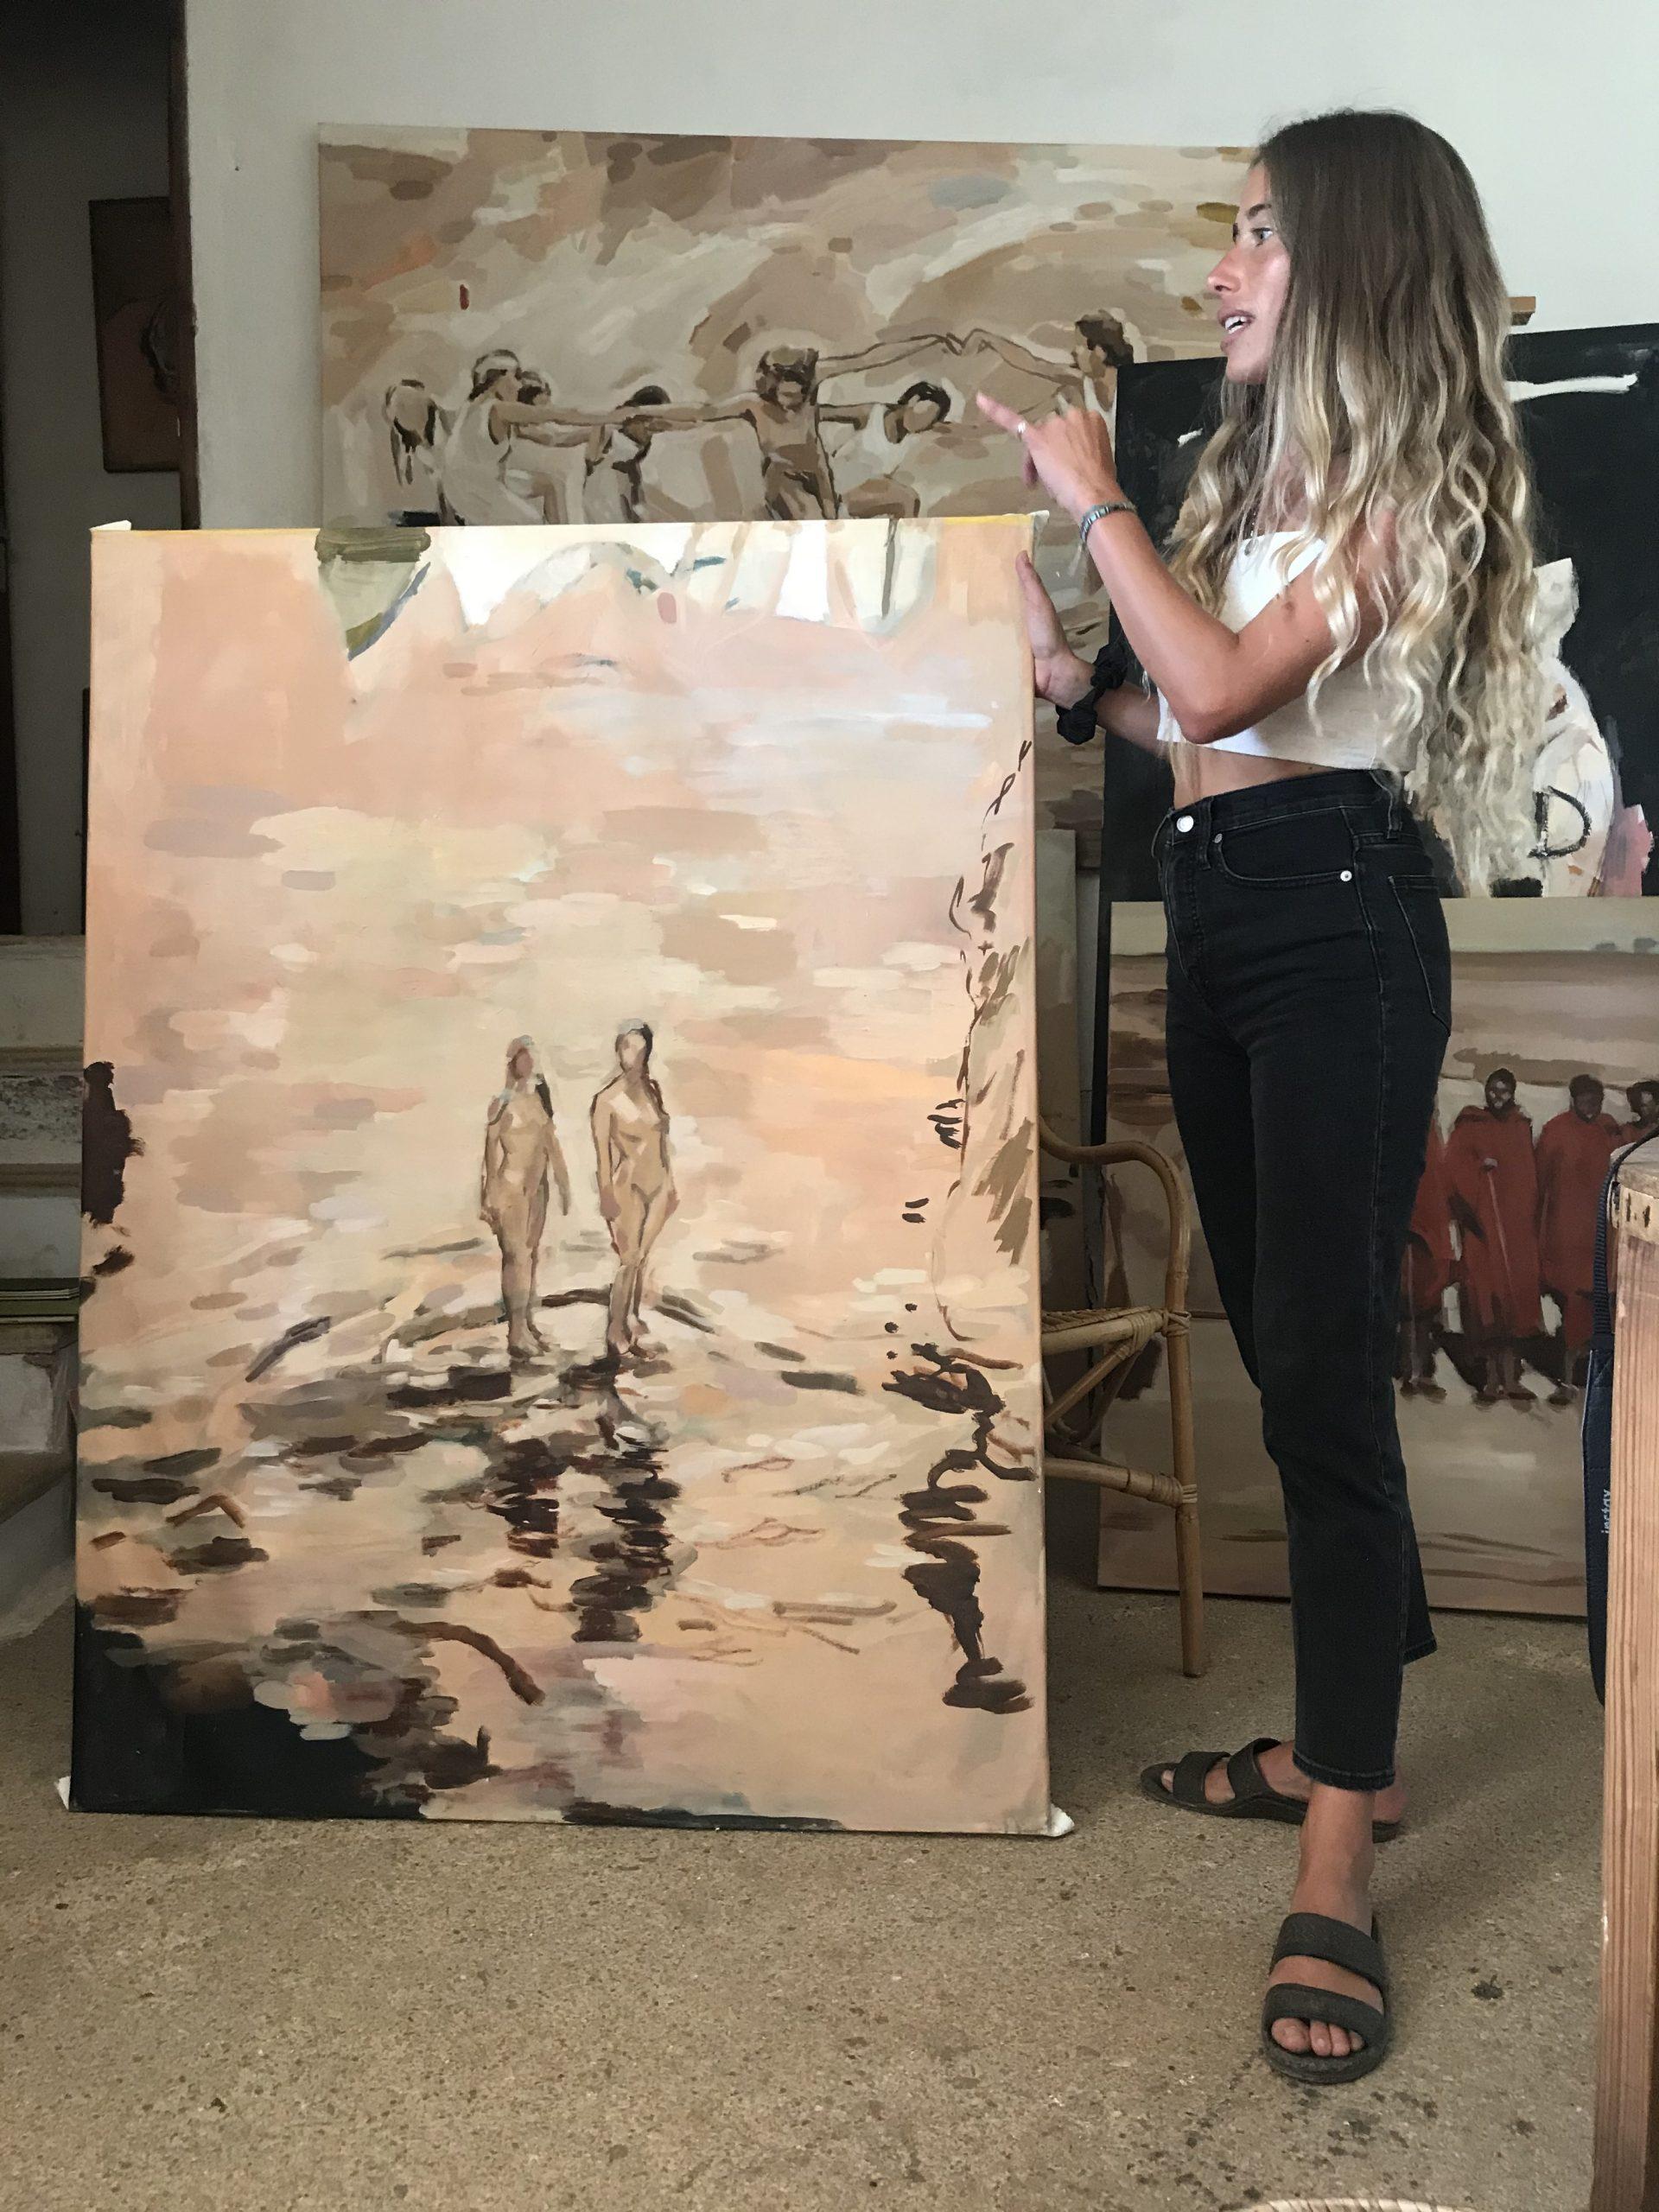 vera.edwards.art.artist.mallorca.thxagain.painter.mallorca.poil.canvas